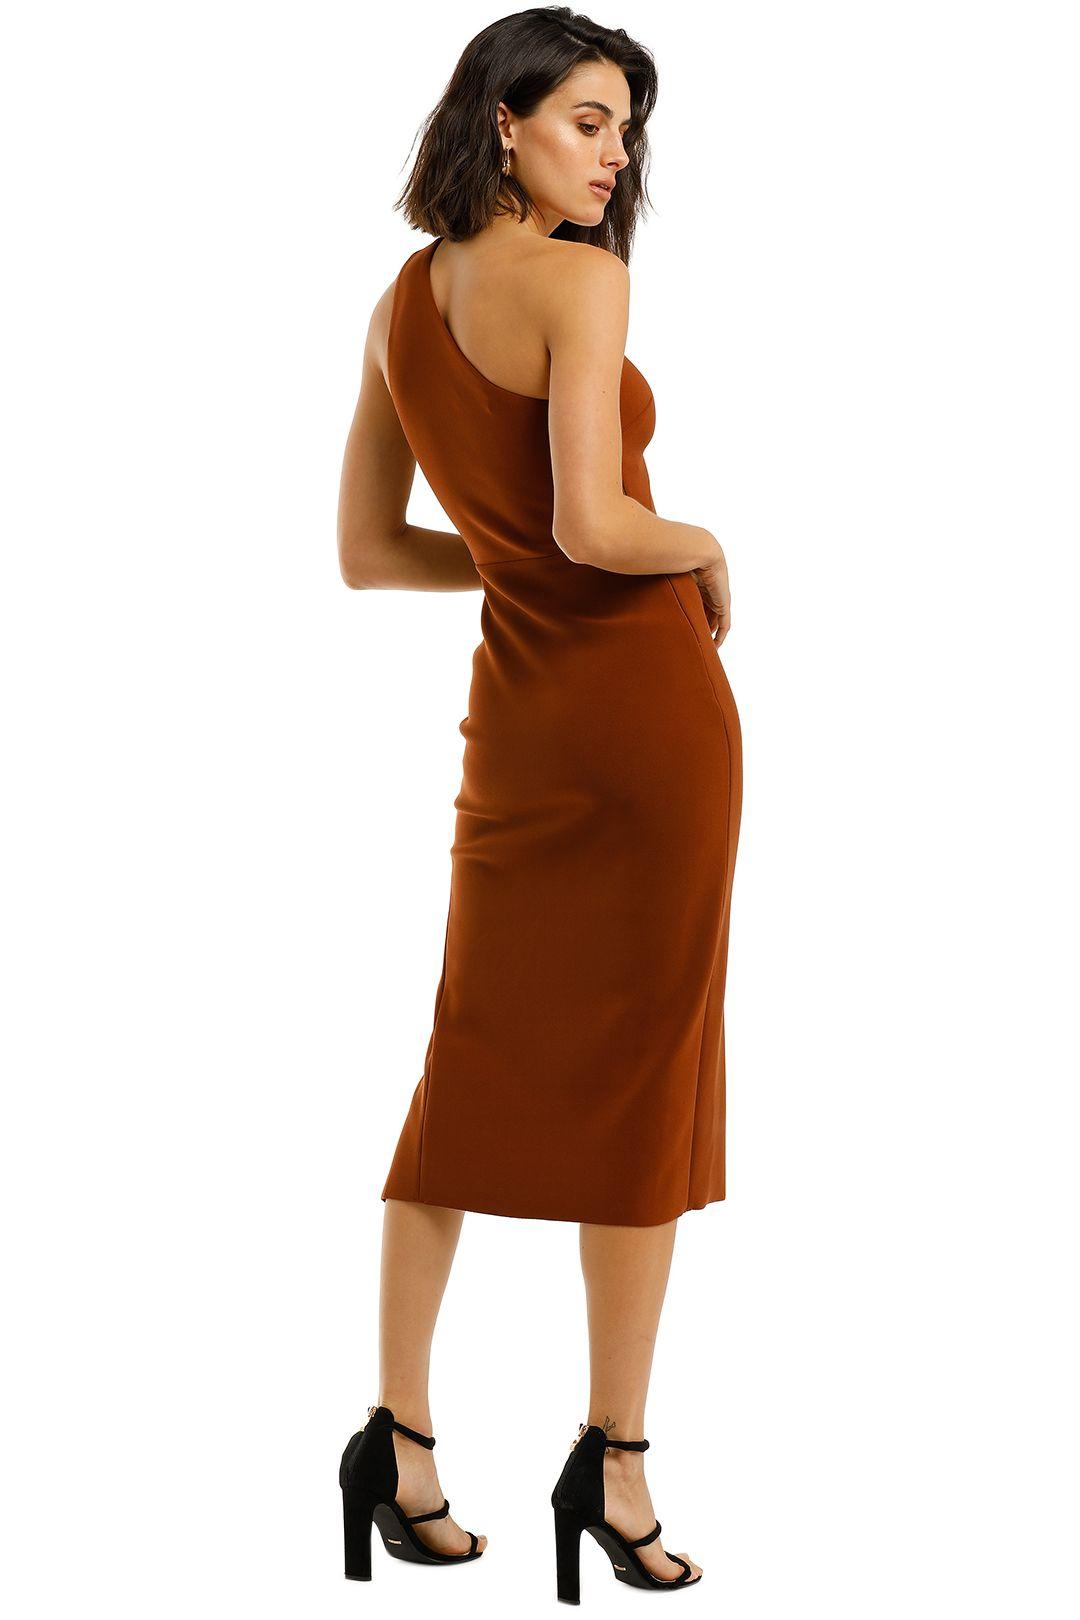 Bec-and-Bridge-Emerald-Avenue-Asymmetric-Midi-Dress-Copper-Back